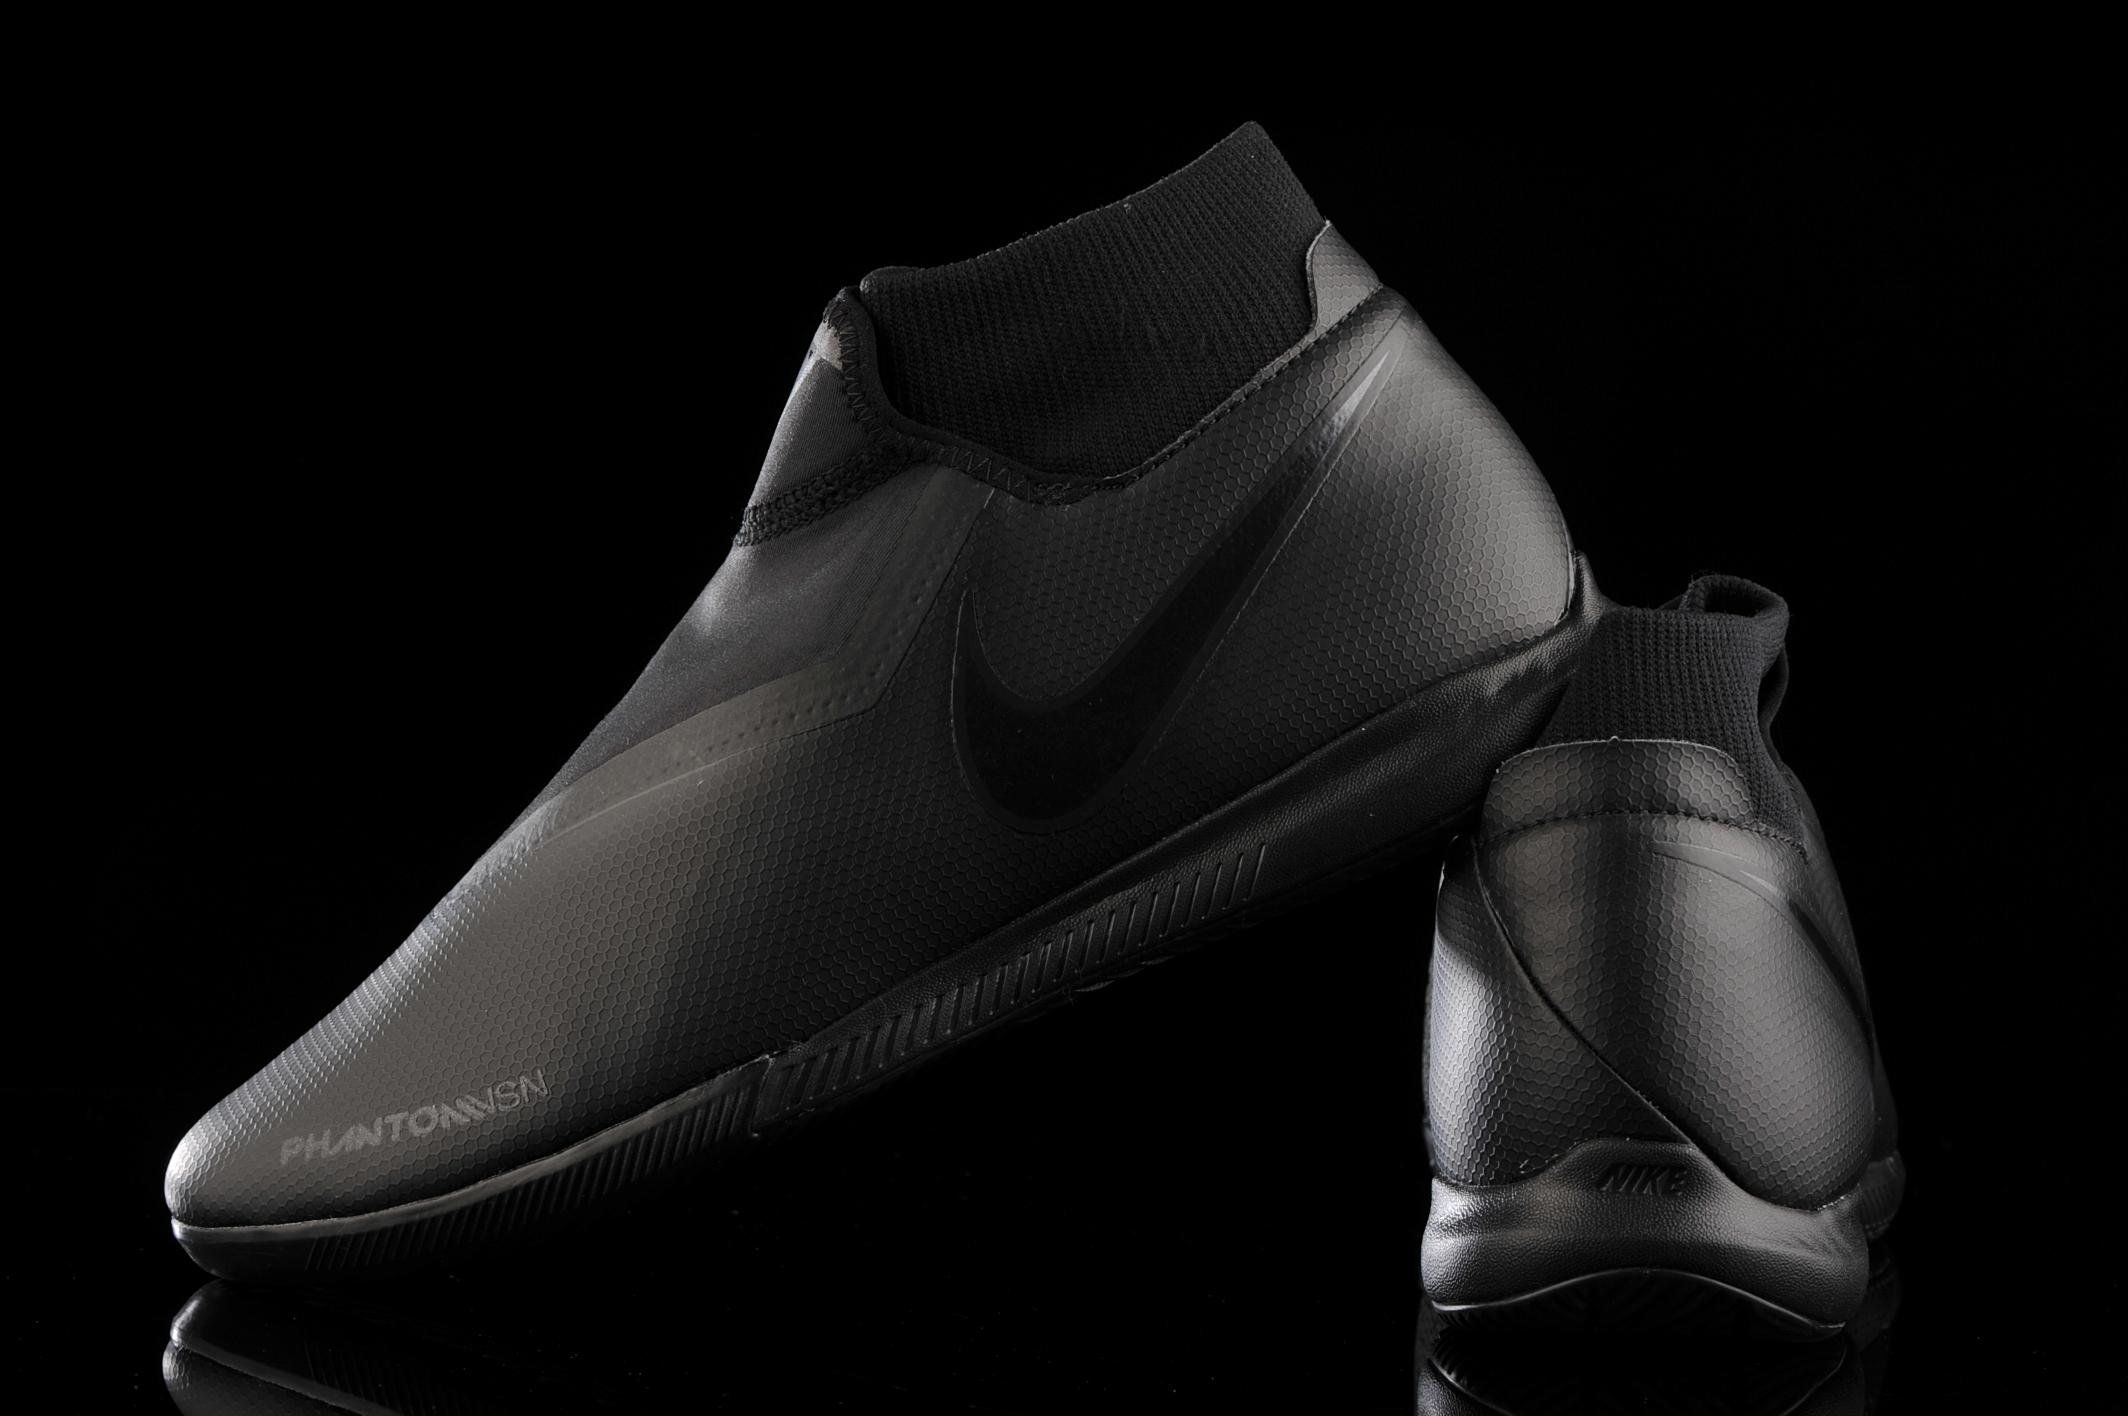 Nike Phantom VSN Academy DF IC AO3267